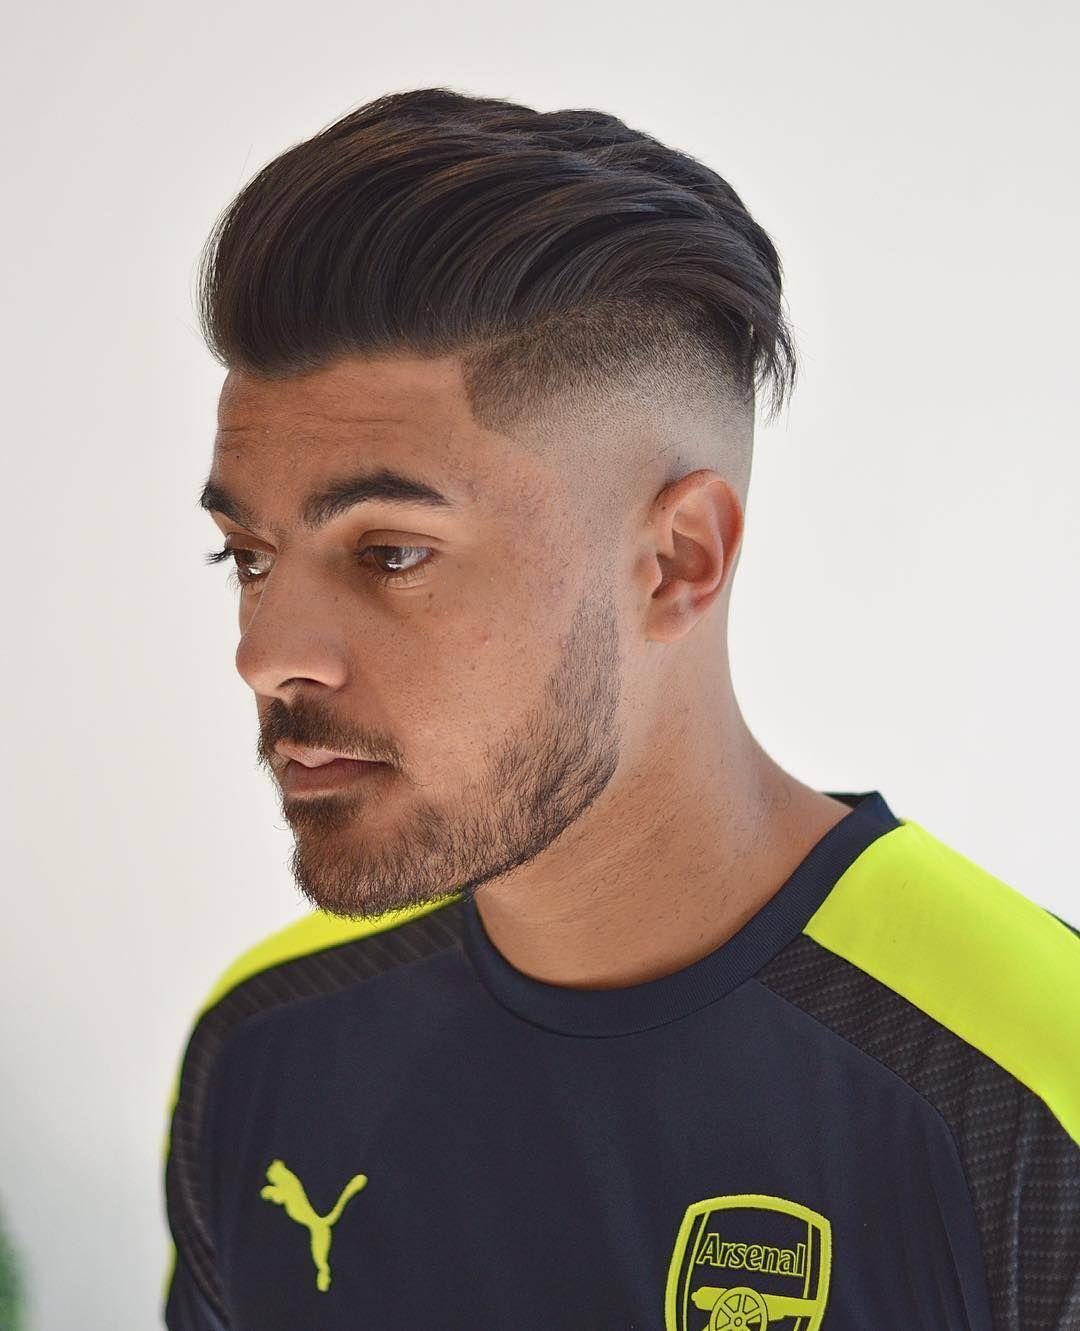 mattjbarbers soccer hair amzpaneser arsenal sweep back high fade